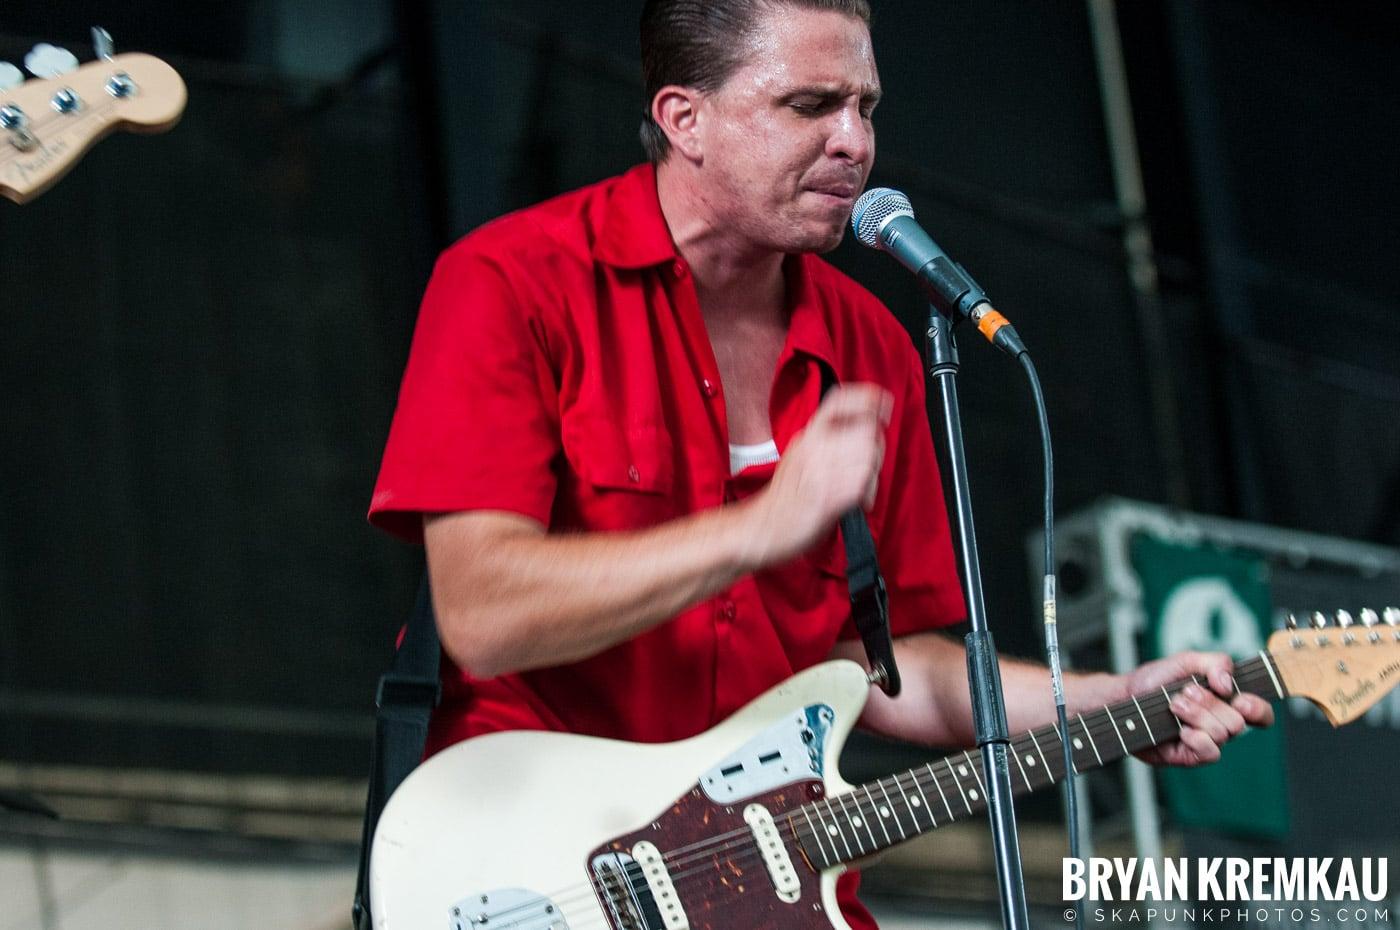 The Aggrolites @ Warped Tour 08, Scranton PA - 7.27.08 (16)